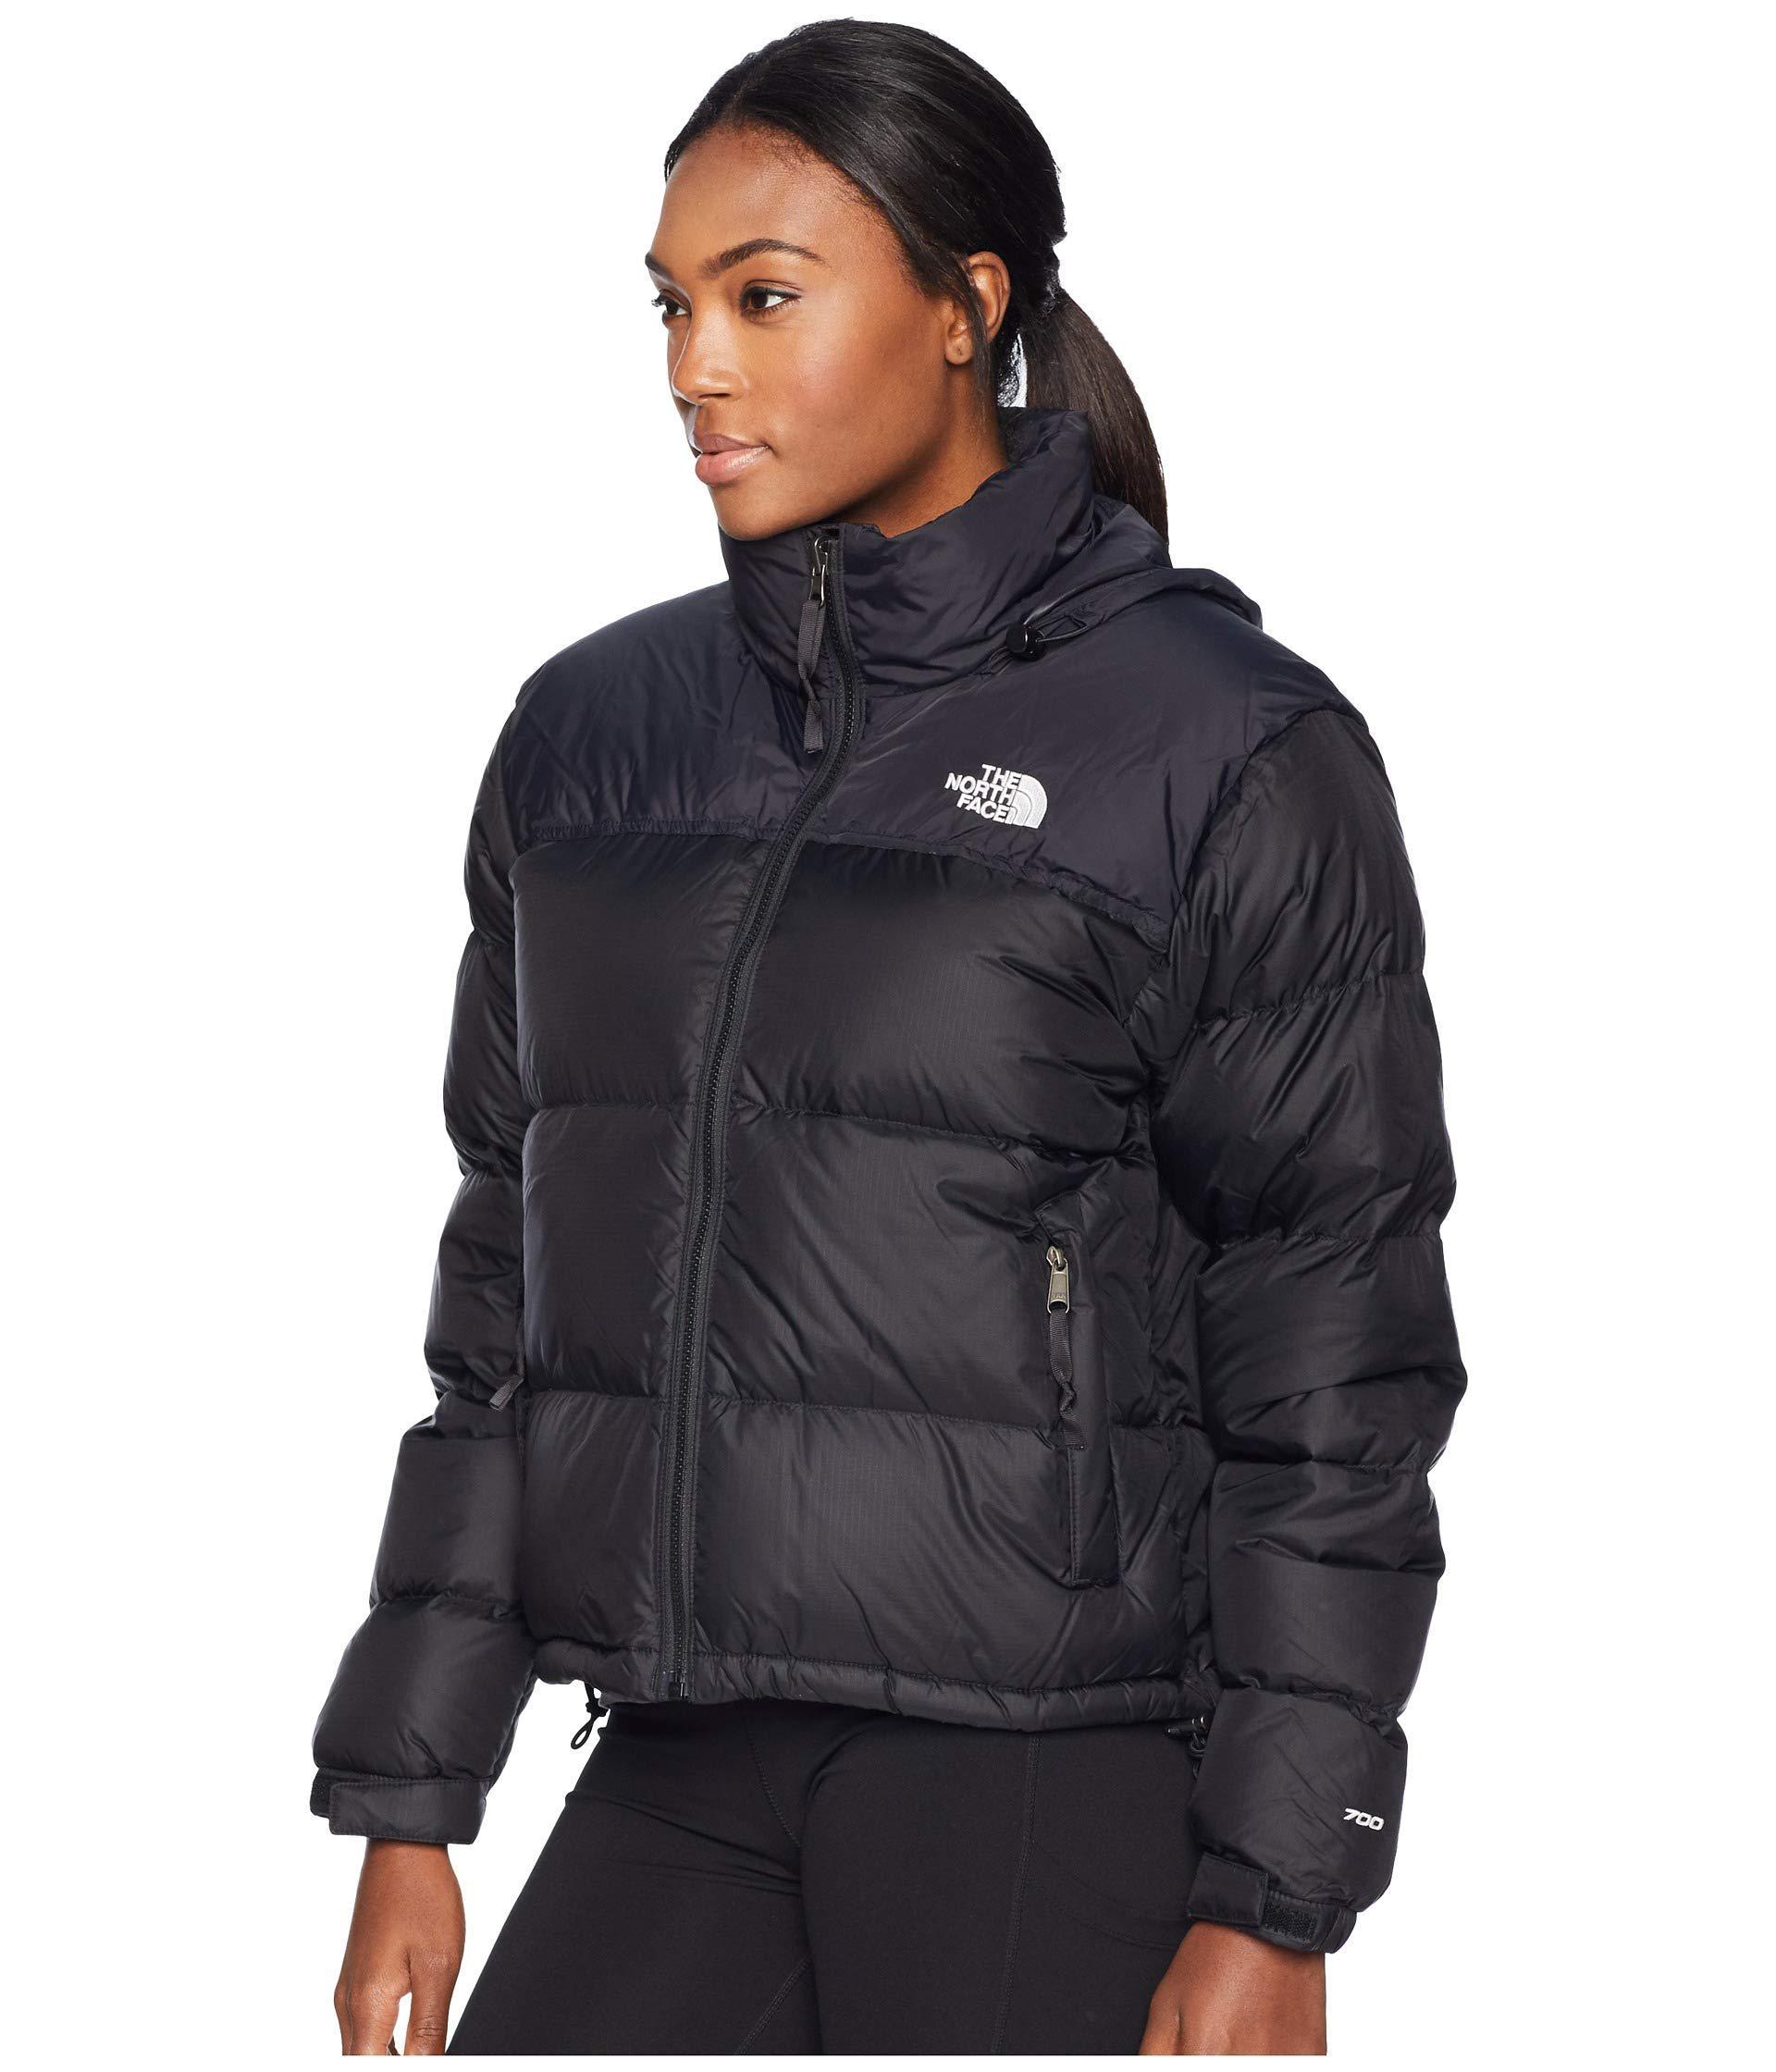 Lyst - The North Face 1996 Retro Nuptse Jacket (tnf Medium Grey Heather) Women s  Coat in Black 3239e1e5e